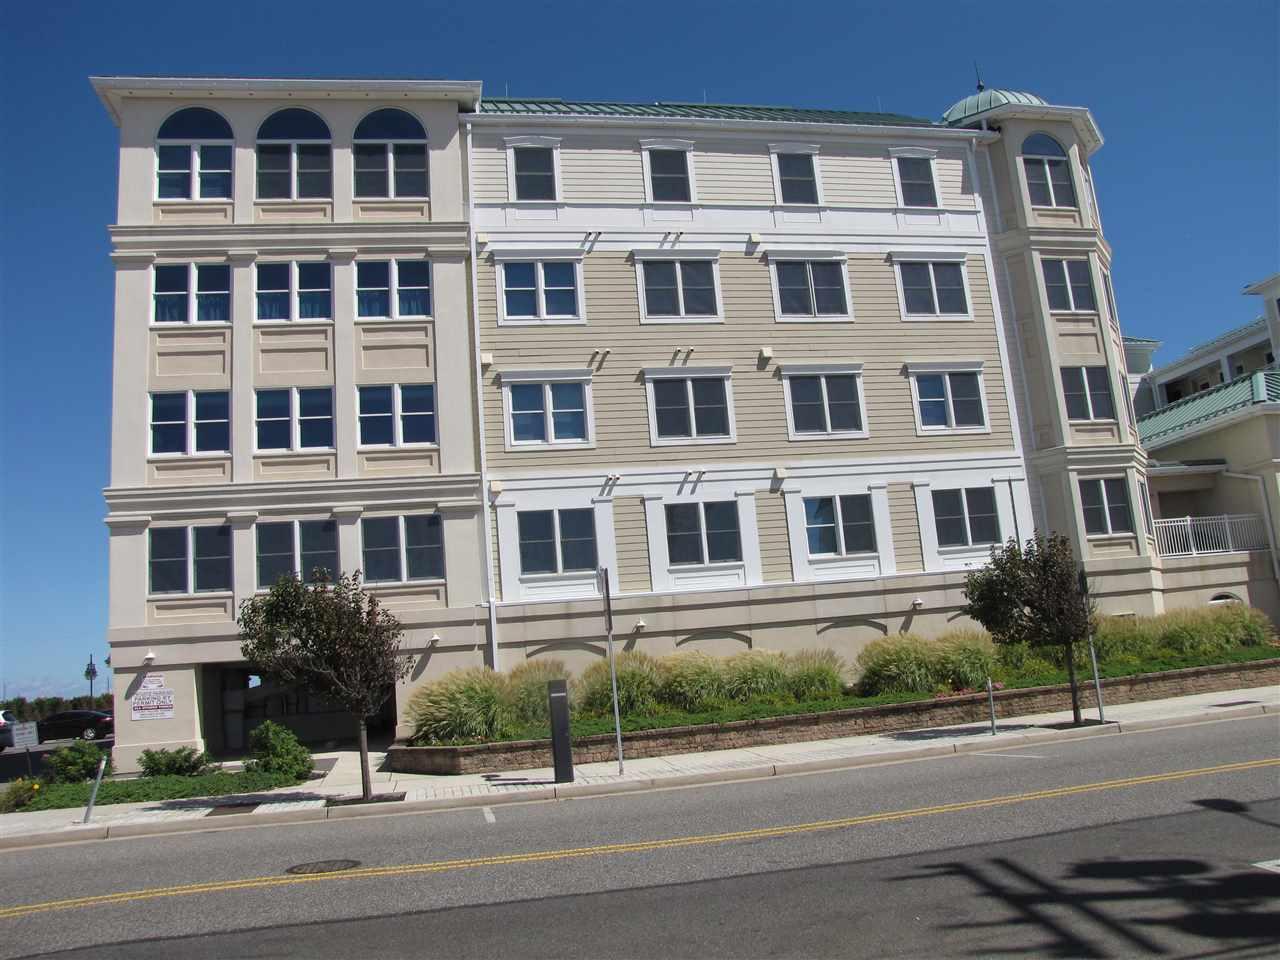 101  Spruce, Unit 112,  North Wildwood, NJ